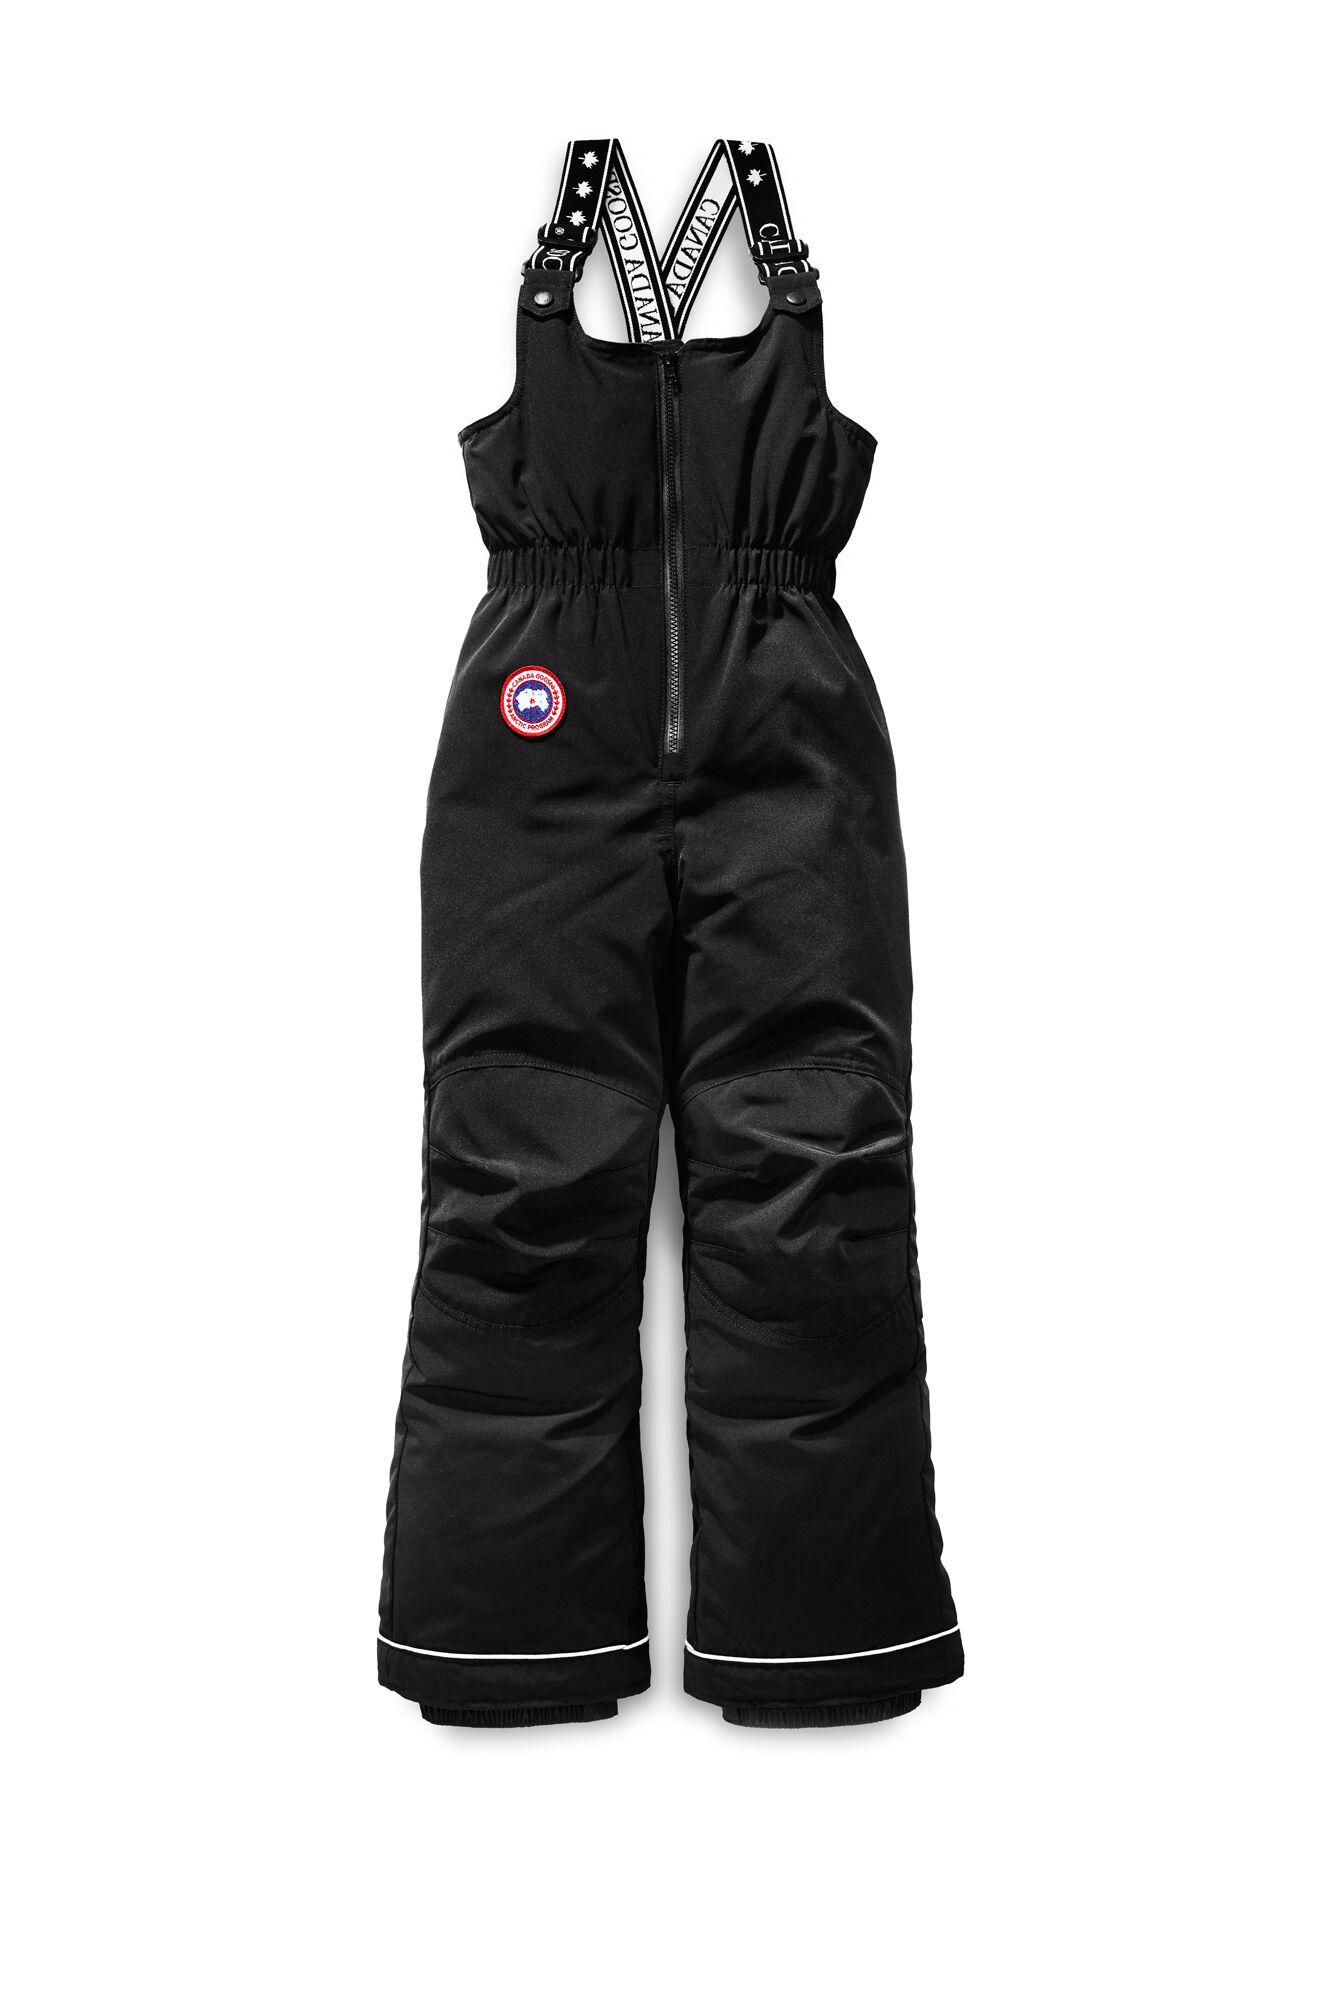 Canada Goose kensington parka outlet store - Kids Outerwear | Parkas Pants Gloves | Canada Goose?